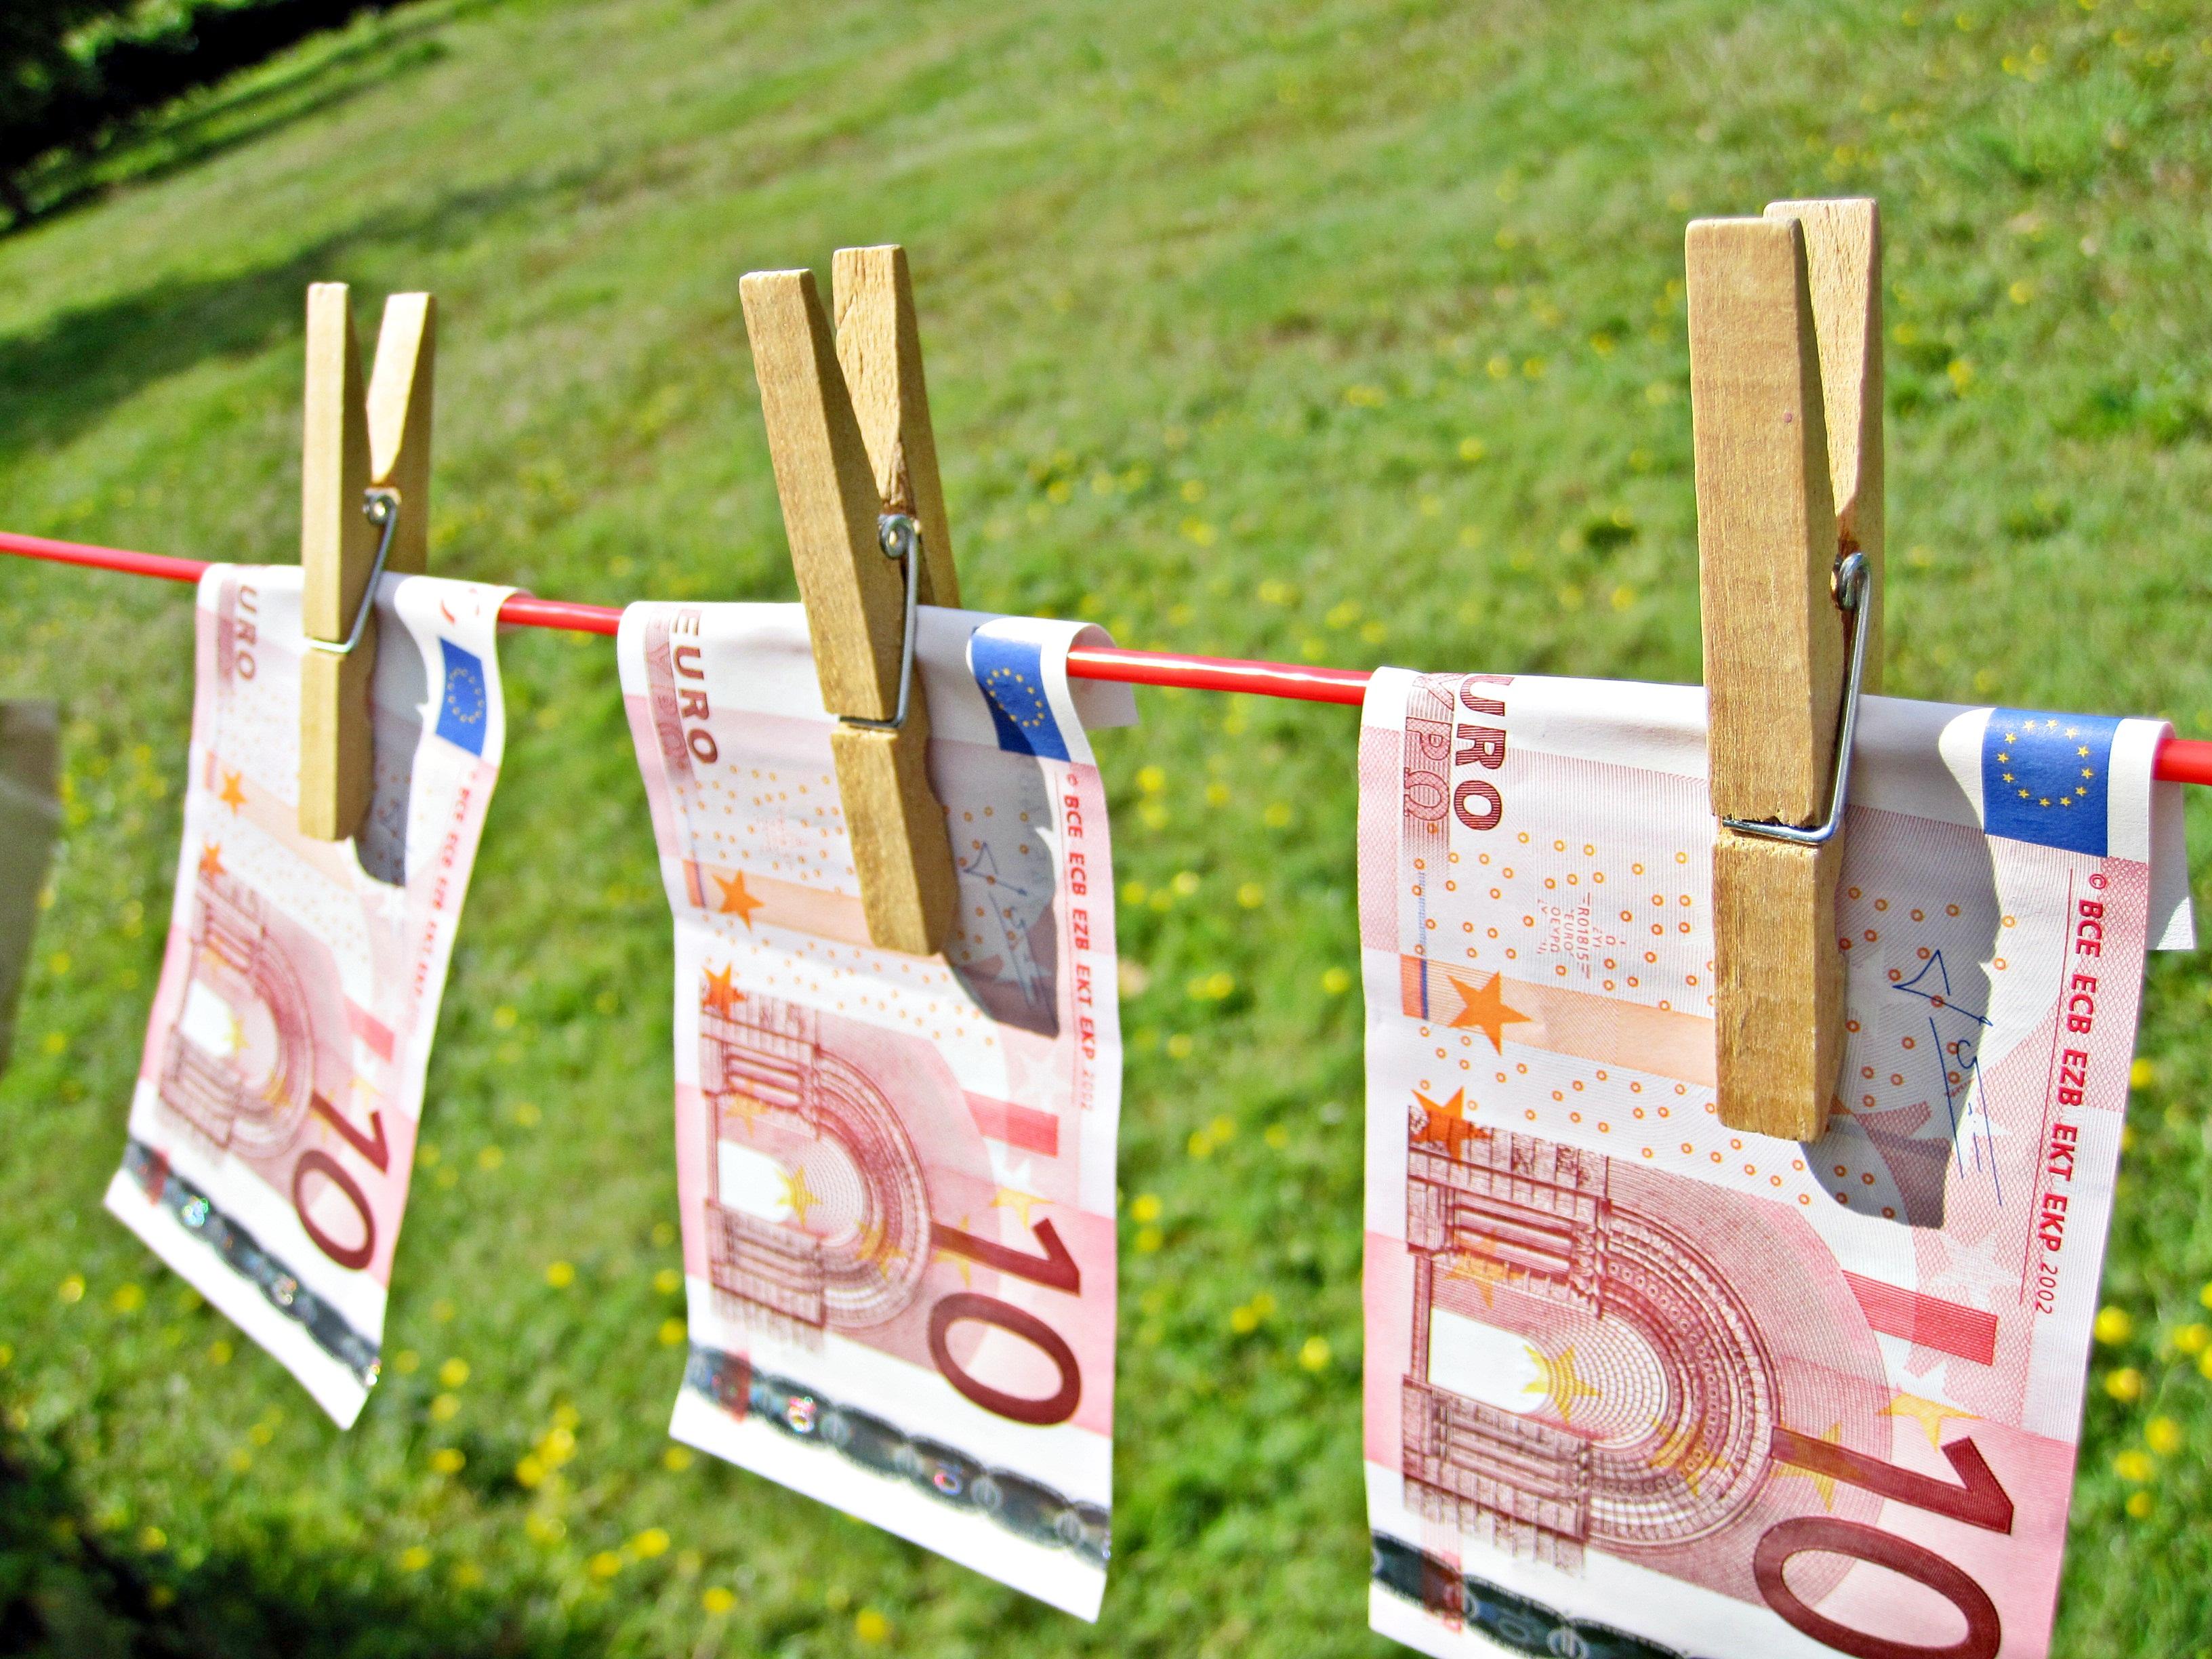 Images Money via flickr